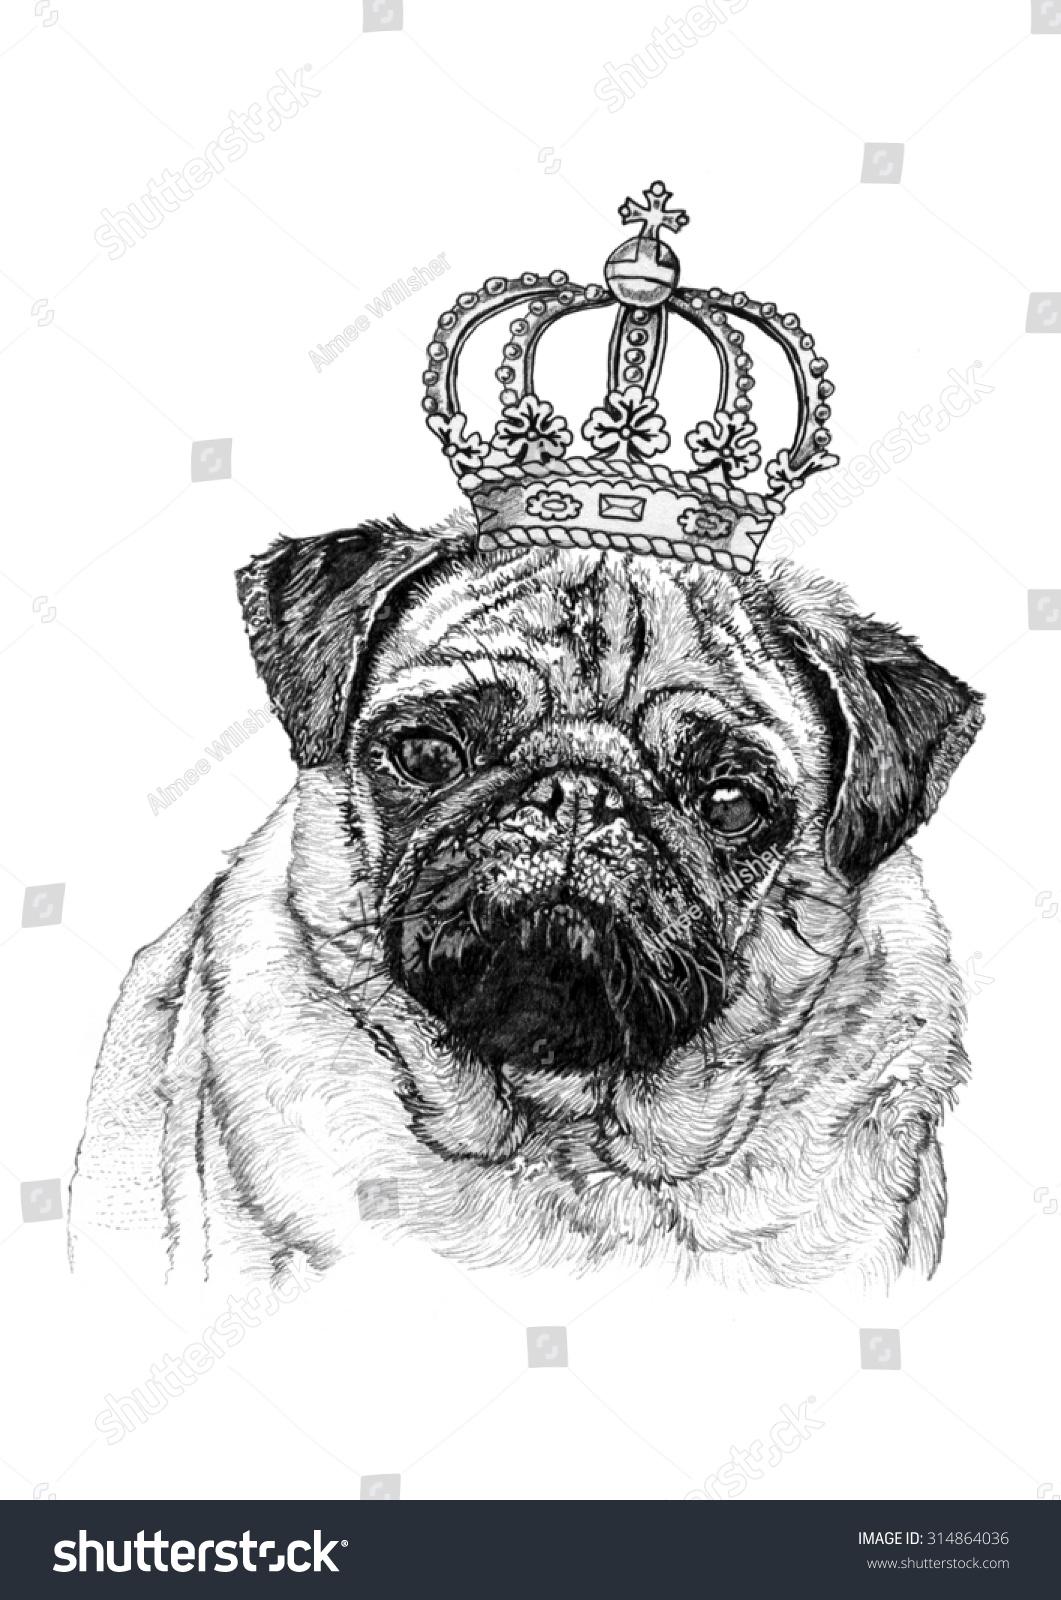 Royal pug face crown pencil drawing stock illustration 314864036